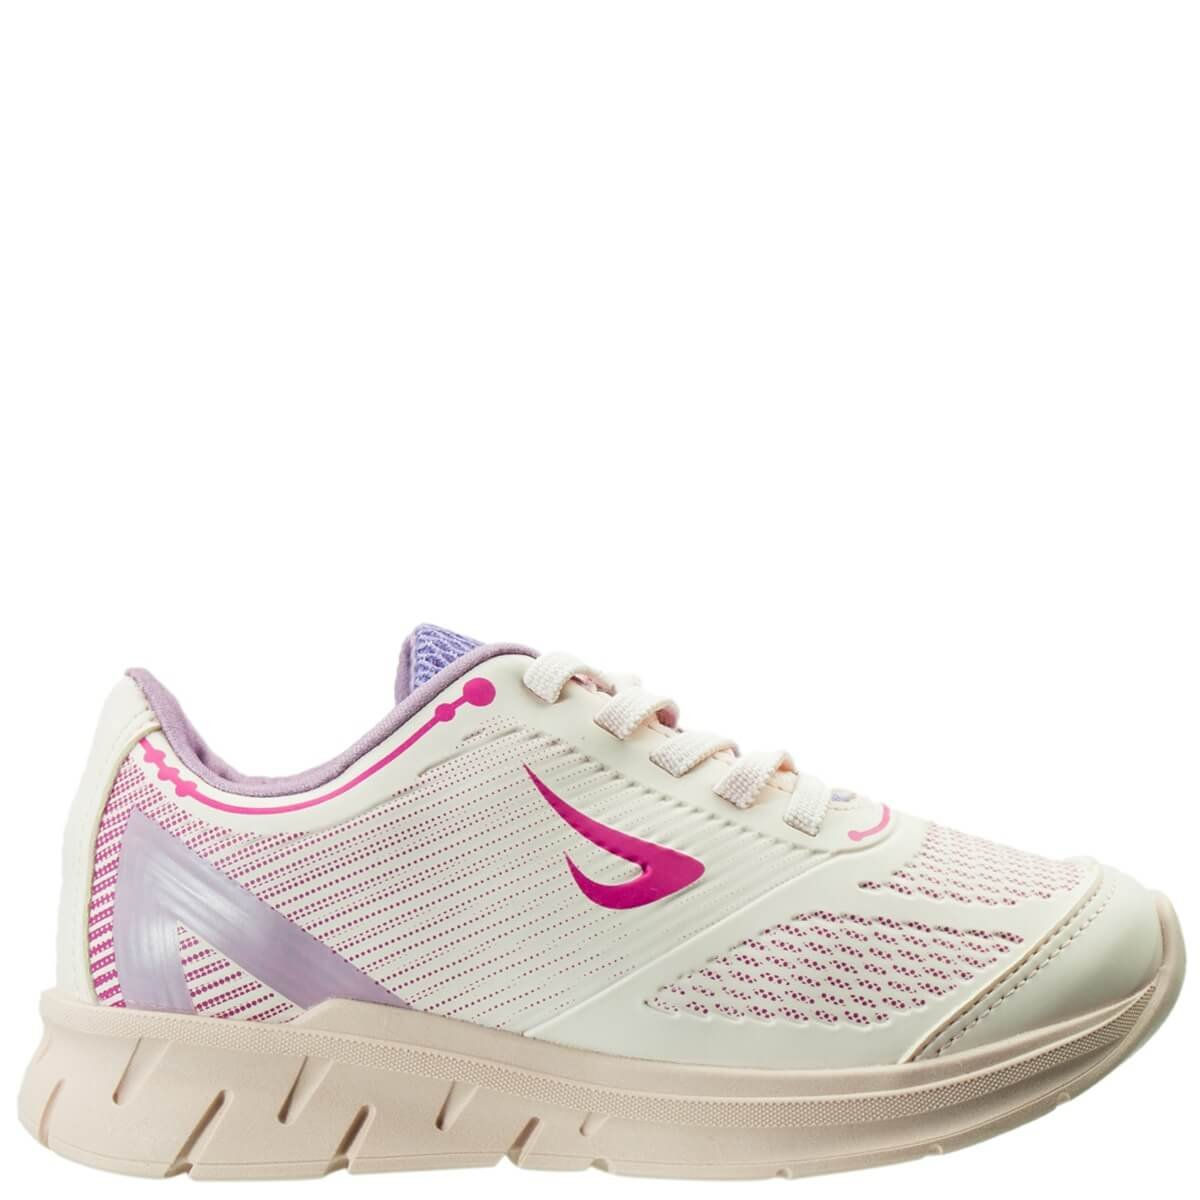 04ff3dc07 Bizz Store - Tênis Infantil Menina Ortopé Jogging Sport Rosa